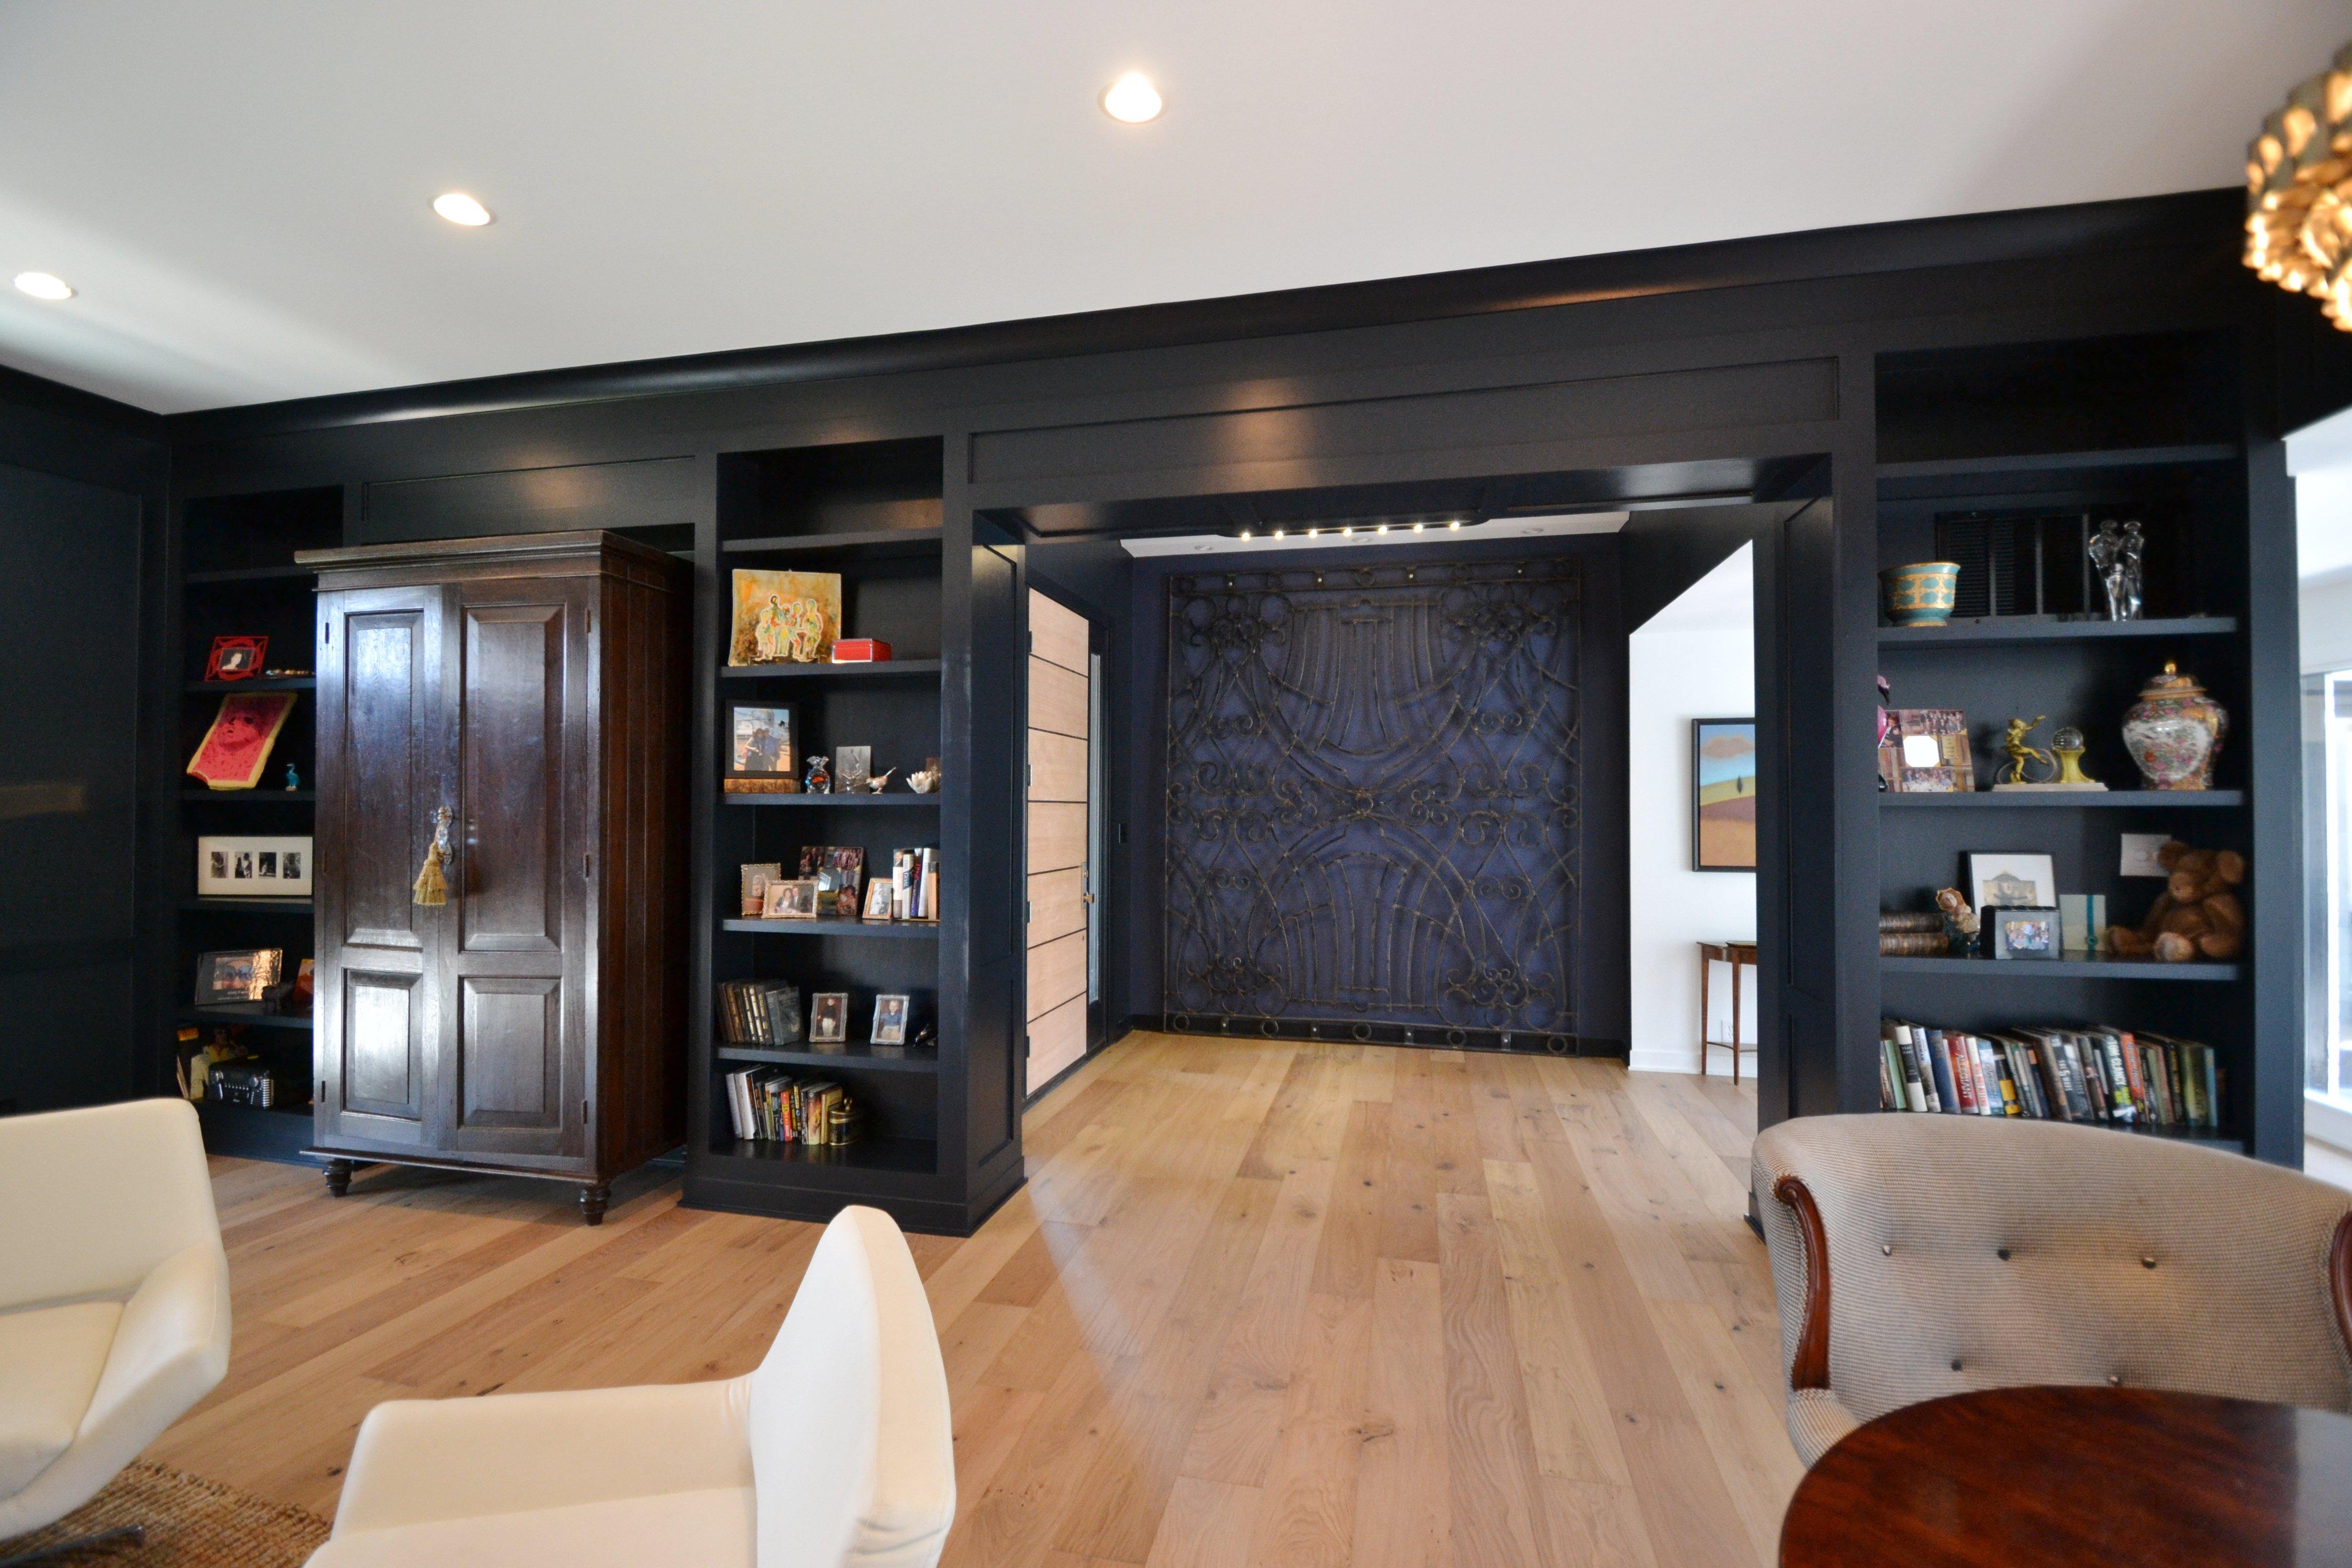 O'sullivan remodel project in Carmel Indiana